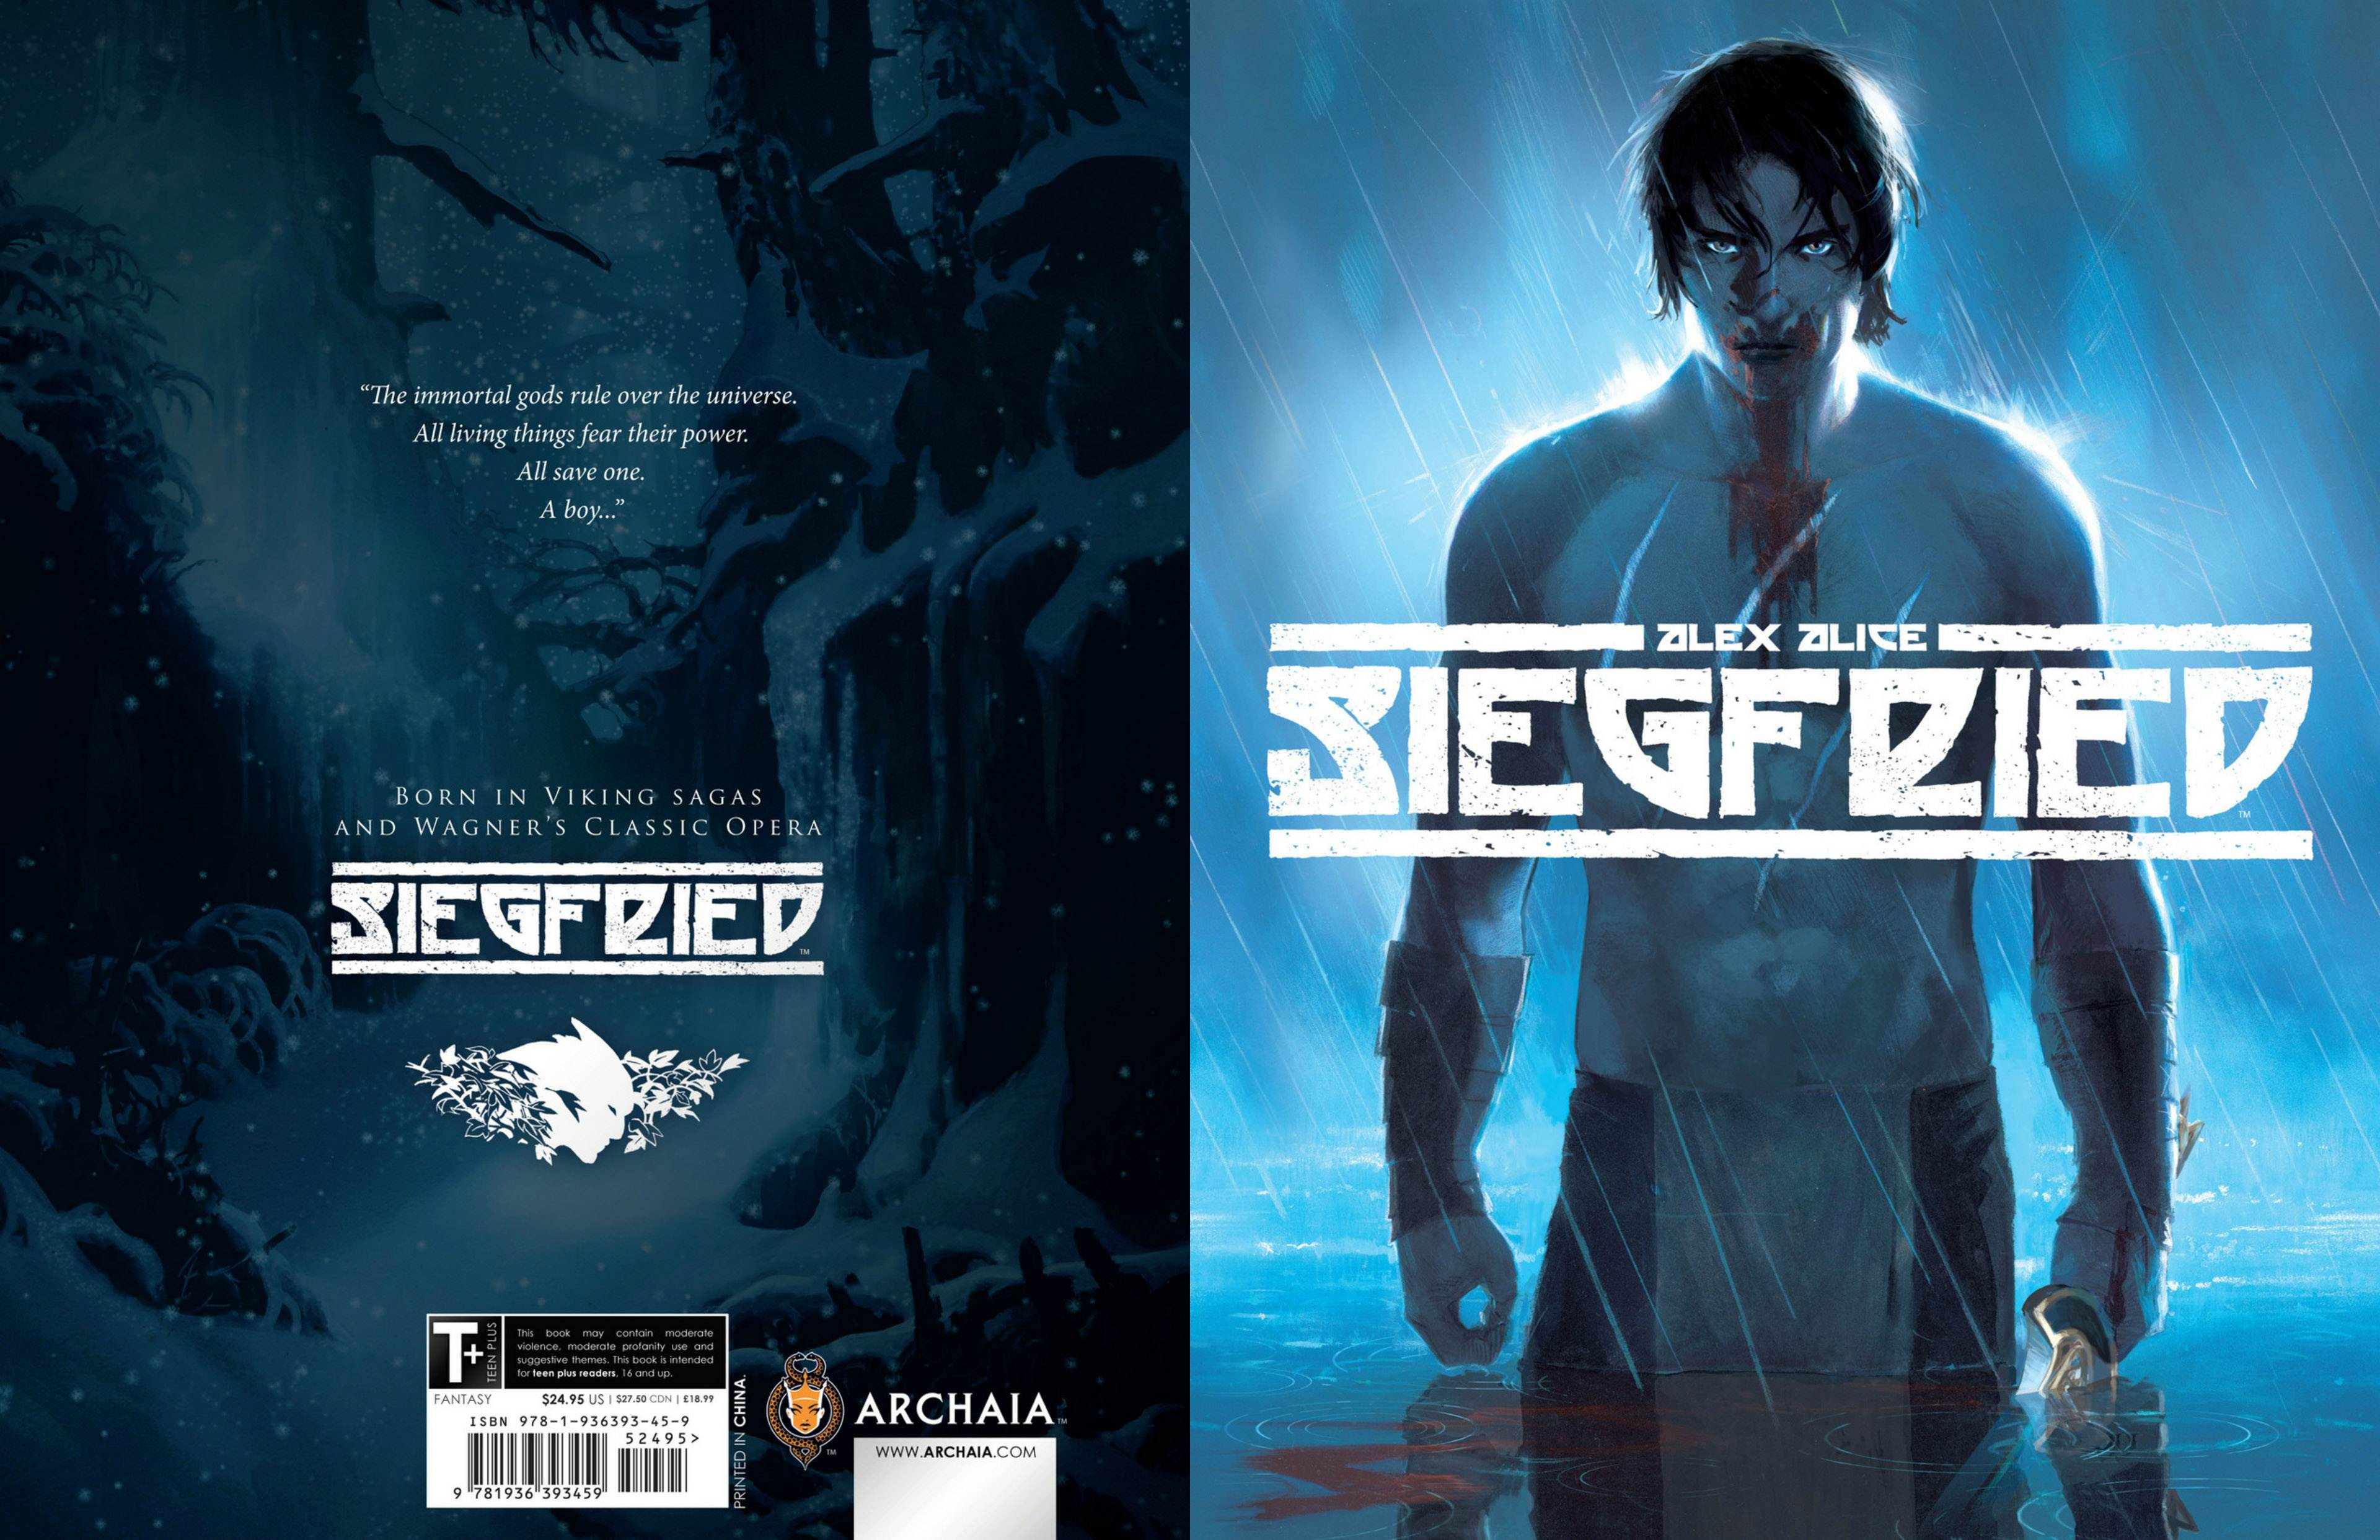 Siegfried Vol 1 (2012) / AvaxHome